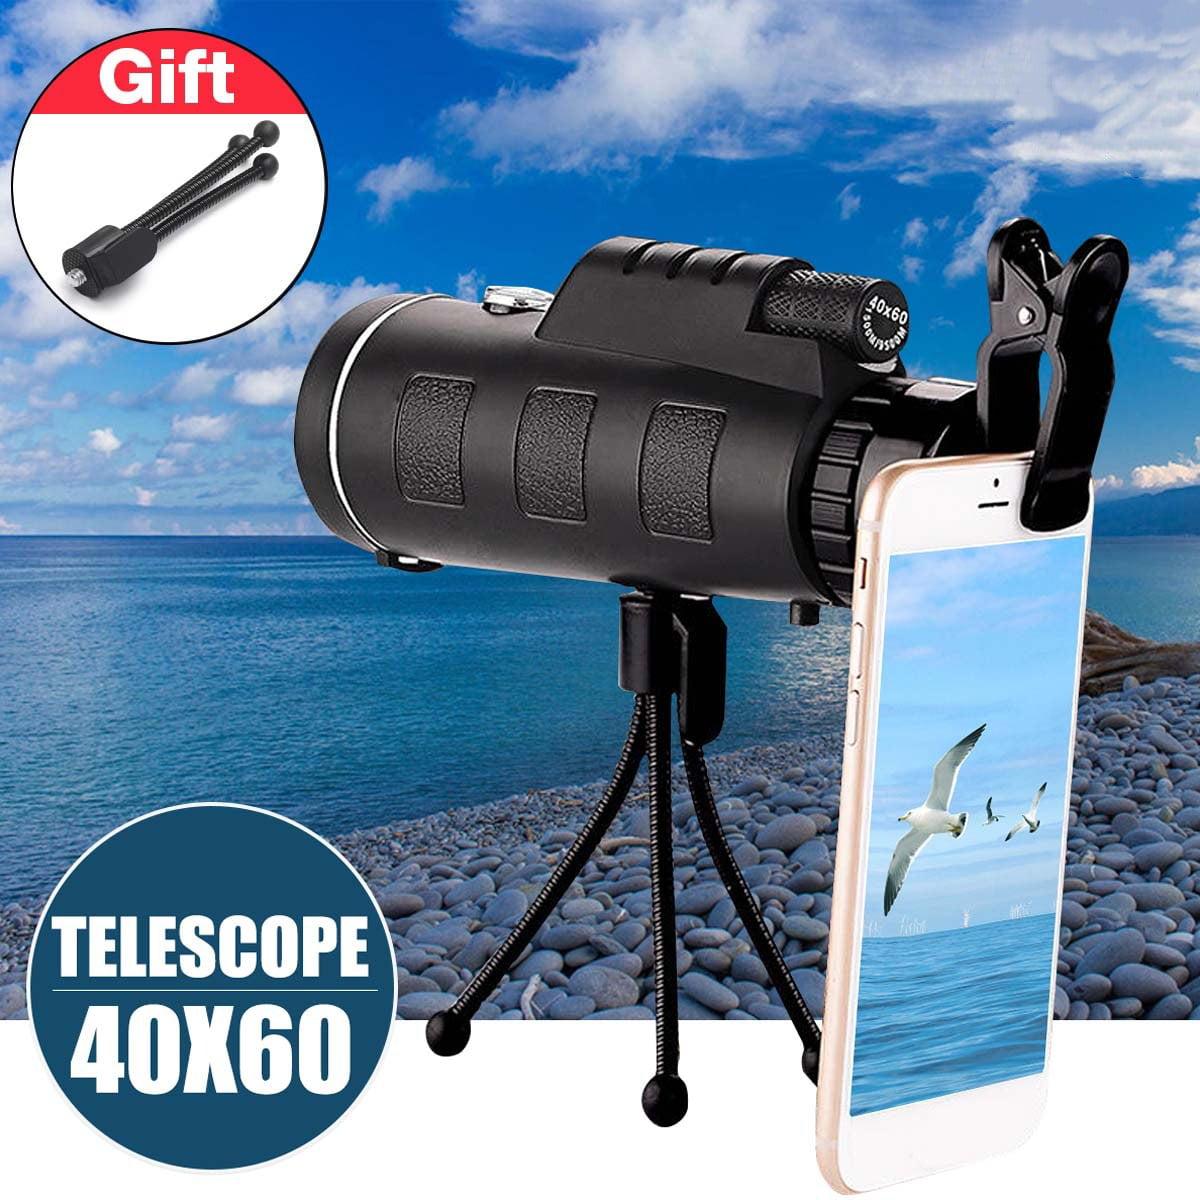 16x52/40x60 HD Waterproof Universal Phone Telescope,Focus Zoom Optical Lens Monocular Telescope+ Tripod + Mini Clip for Outdoor starrysky Camping Hunting Traveling